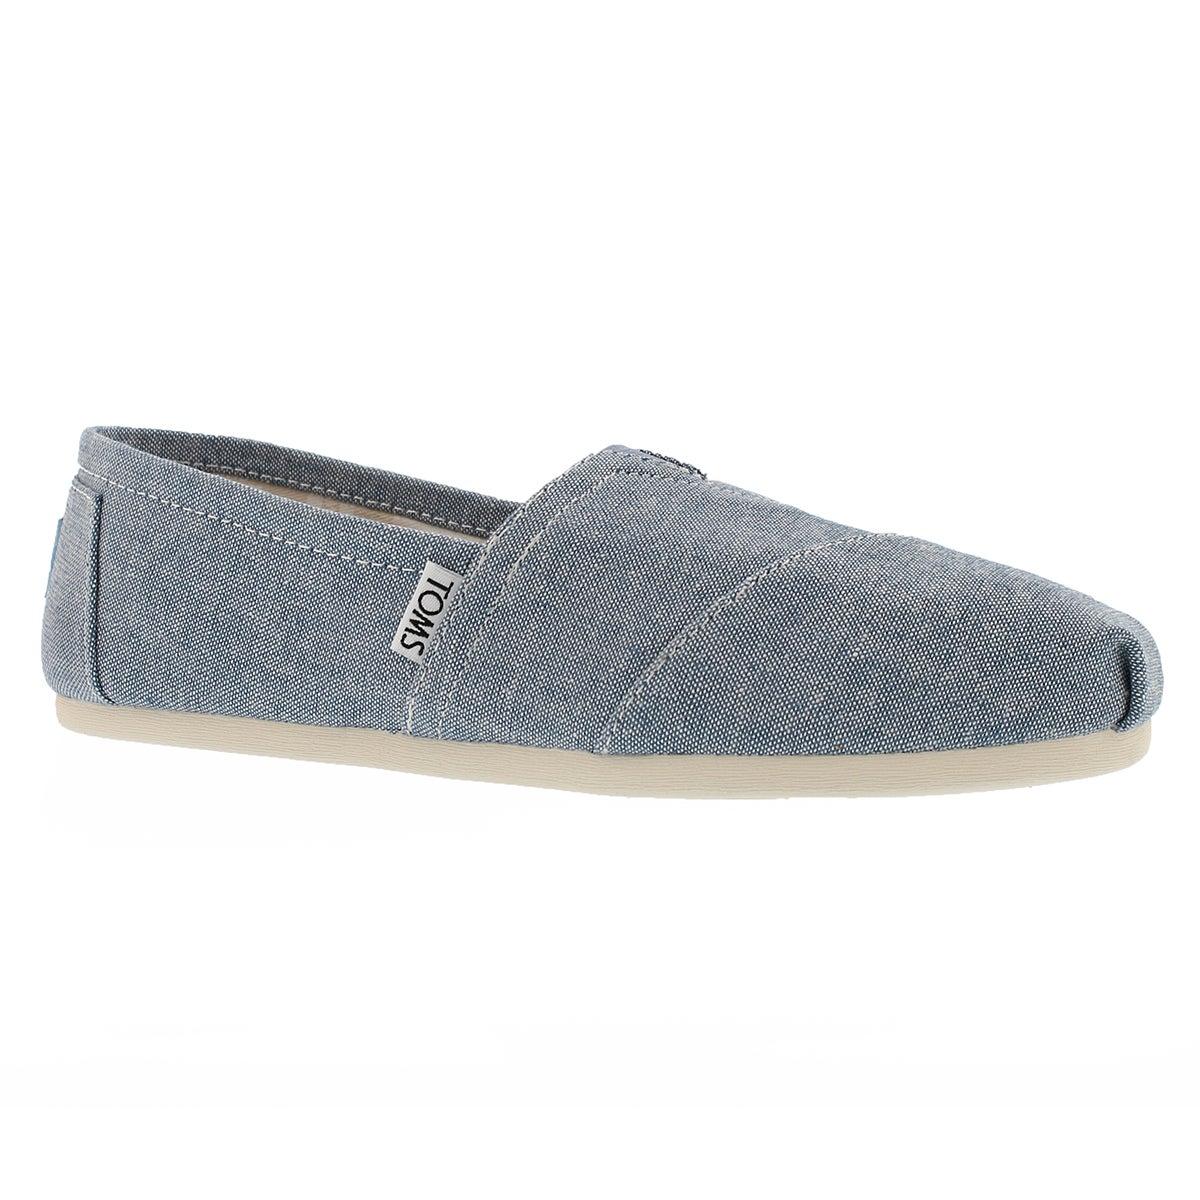 Women's SEASONAL CLASSIC blue slub loafers